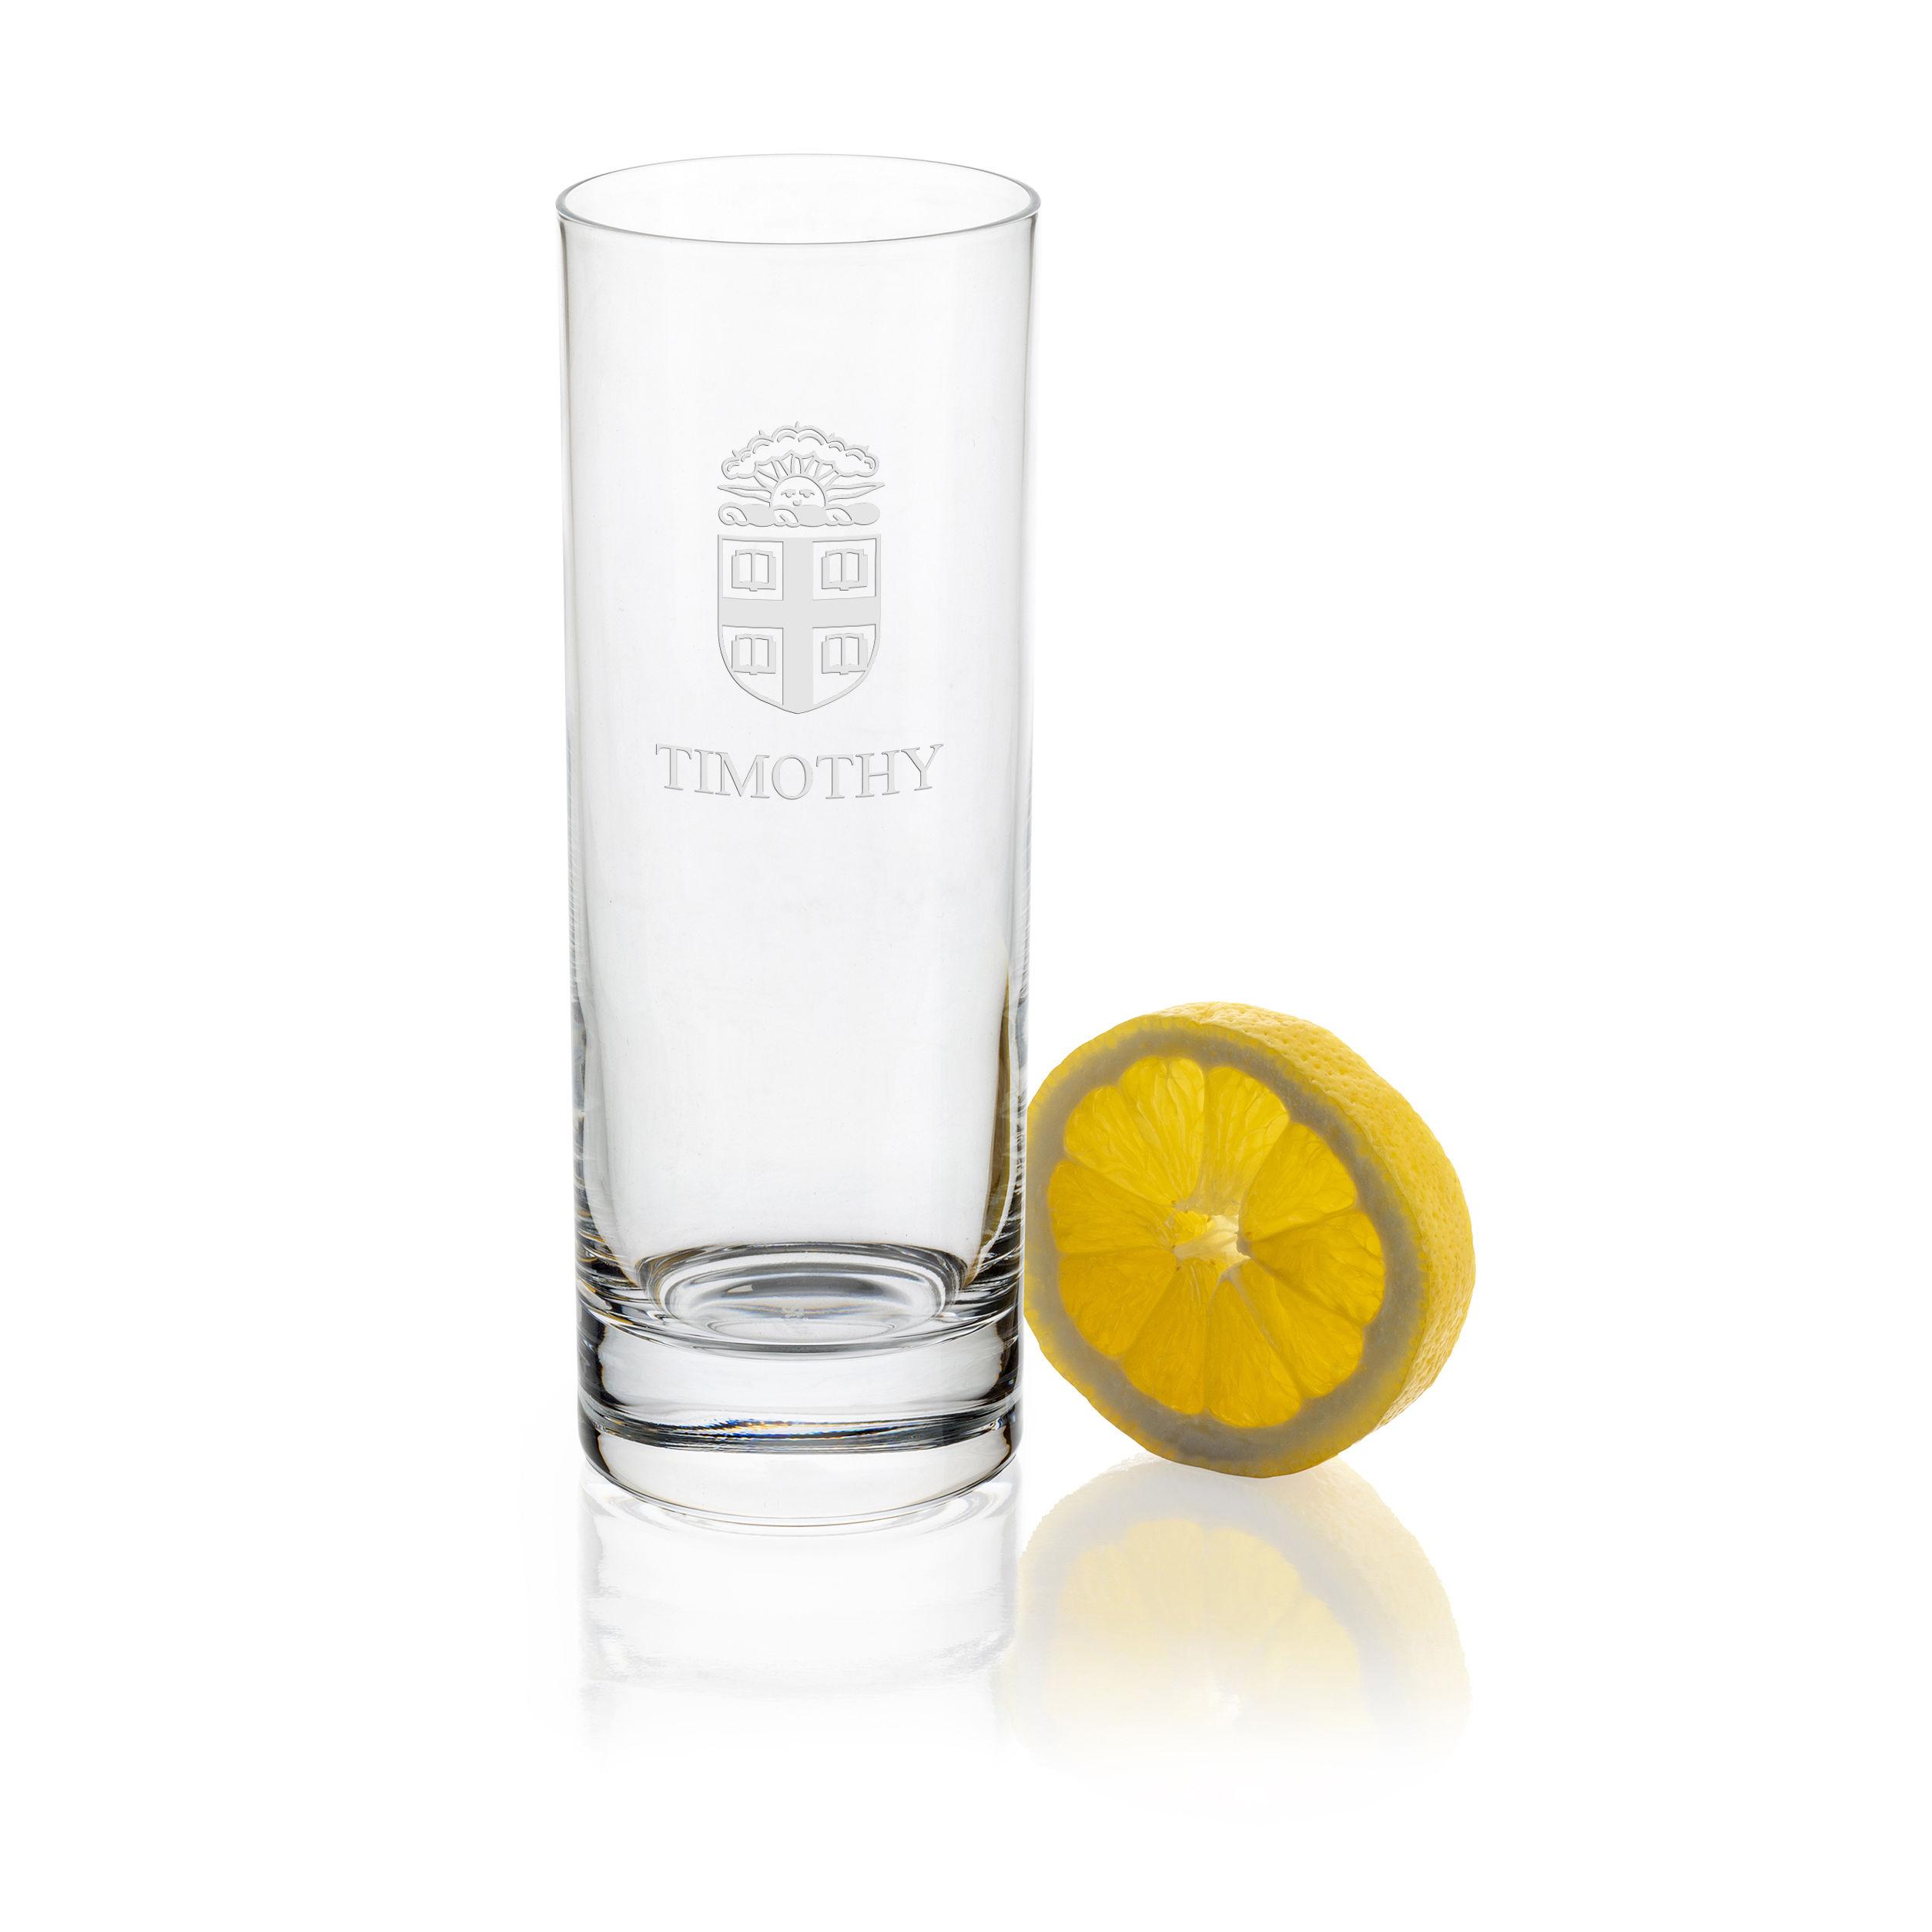 Brown University Iced Beverage Glasses - Set of 2